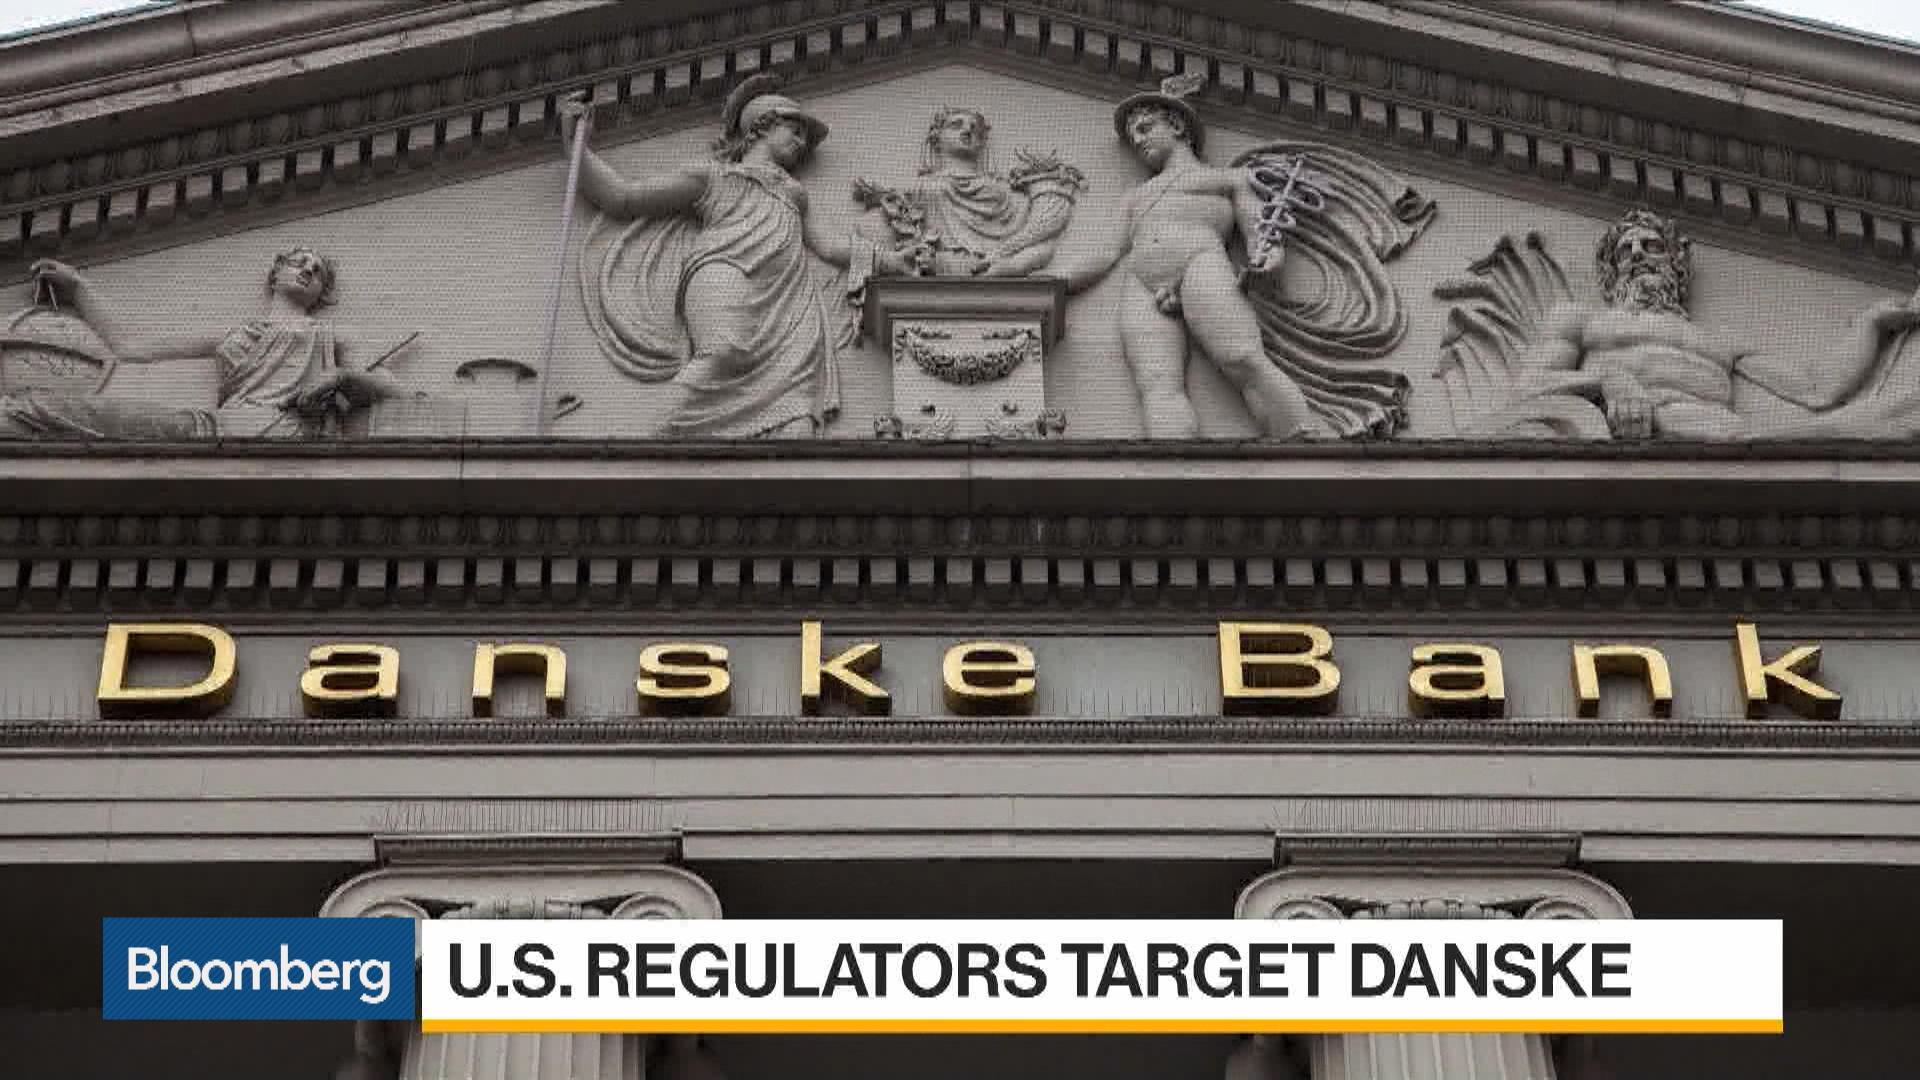 U.S. Regulators Target Danske Bank